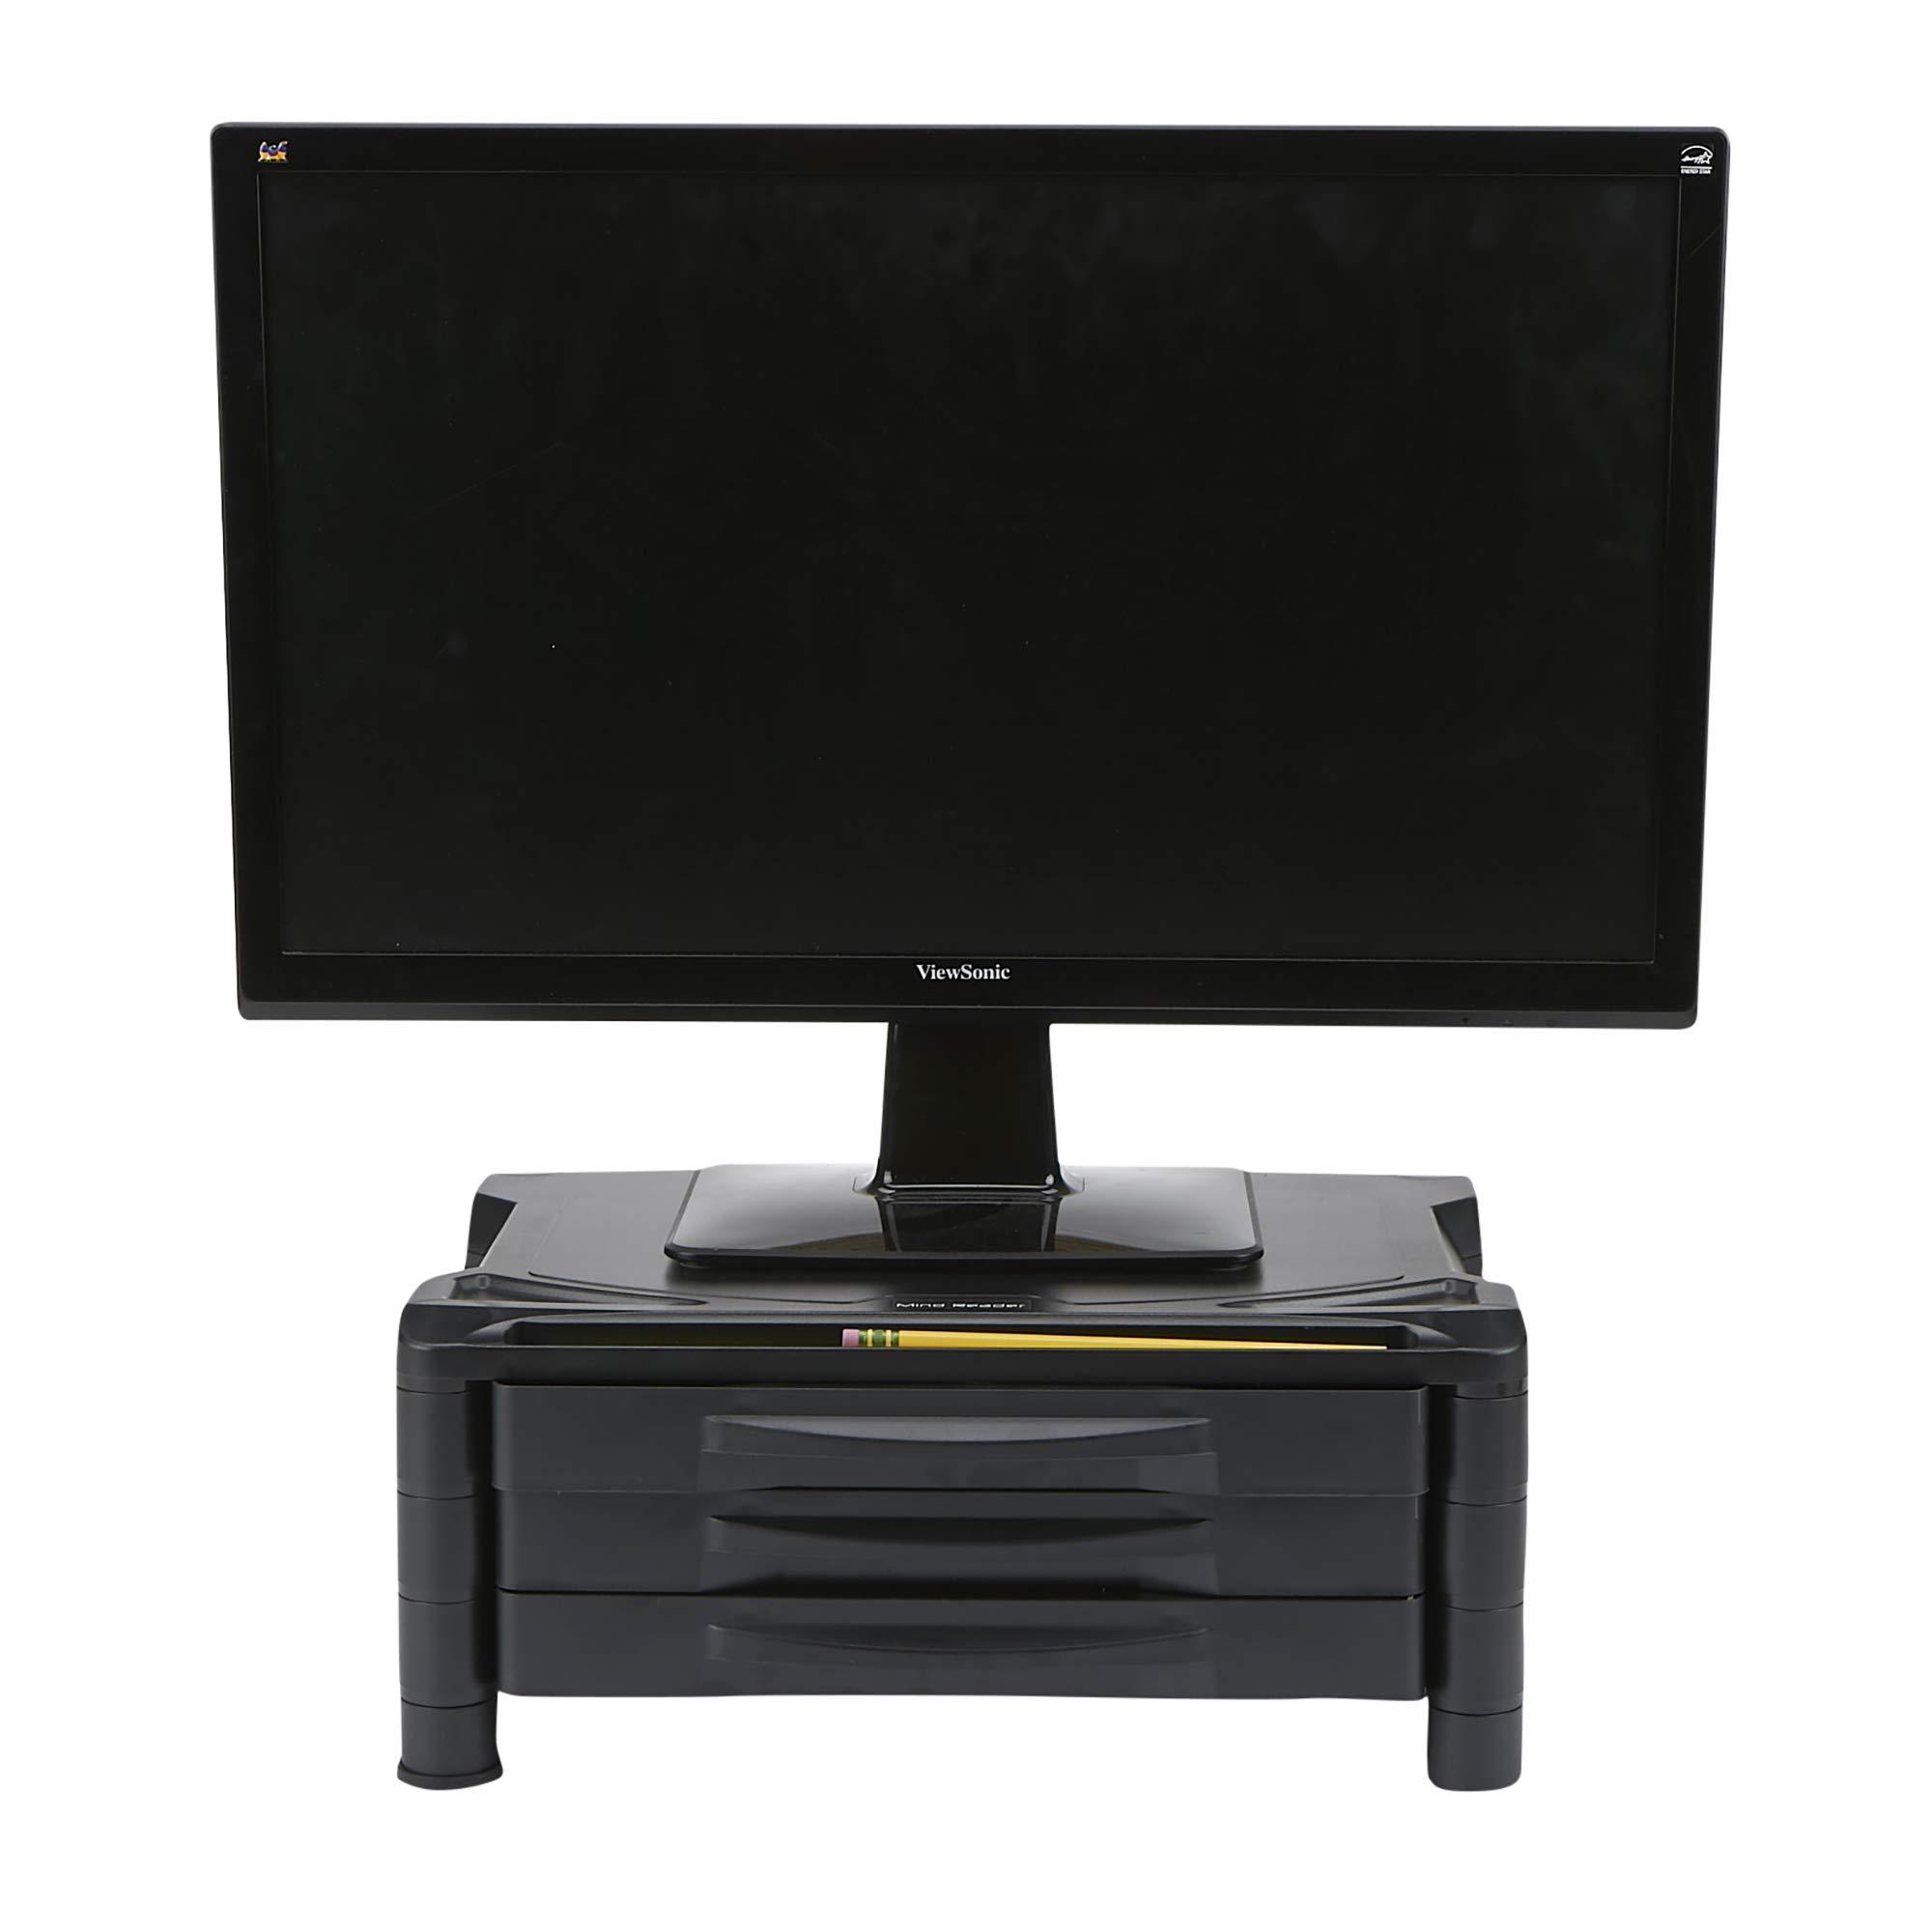 Mind Reader 3DRPLMONST-BLK 3 Drawer Tier Plastic Monitor Stand with Storage for Computer, Laptop, Desk, iMac, Dell, HP, Printer, Black, by Mind Reader